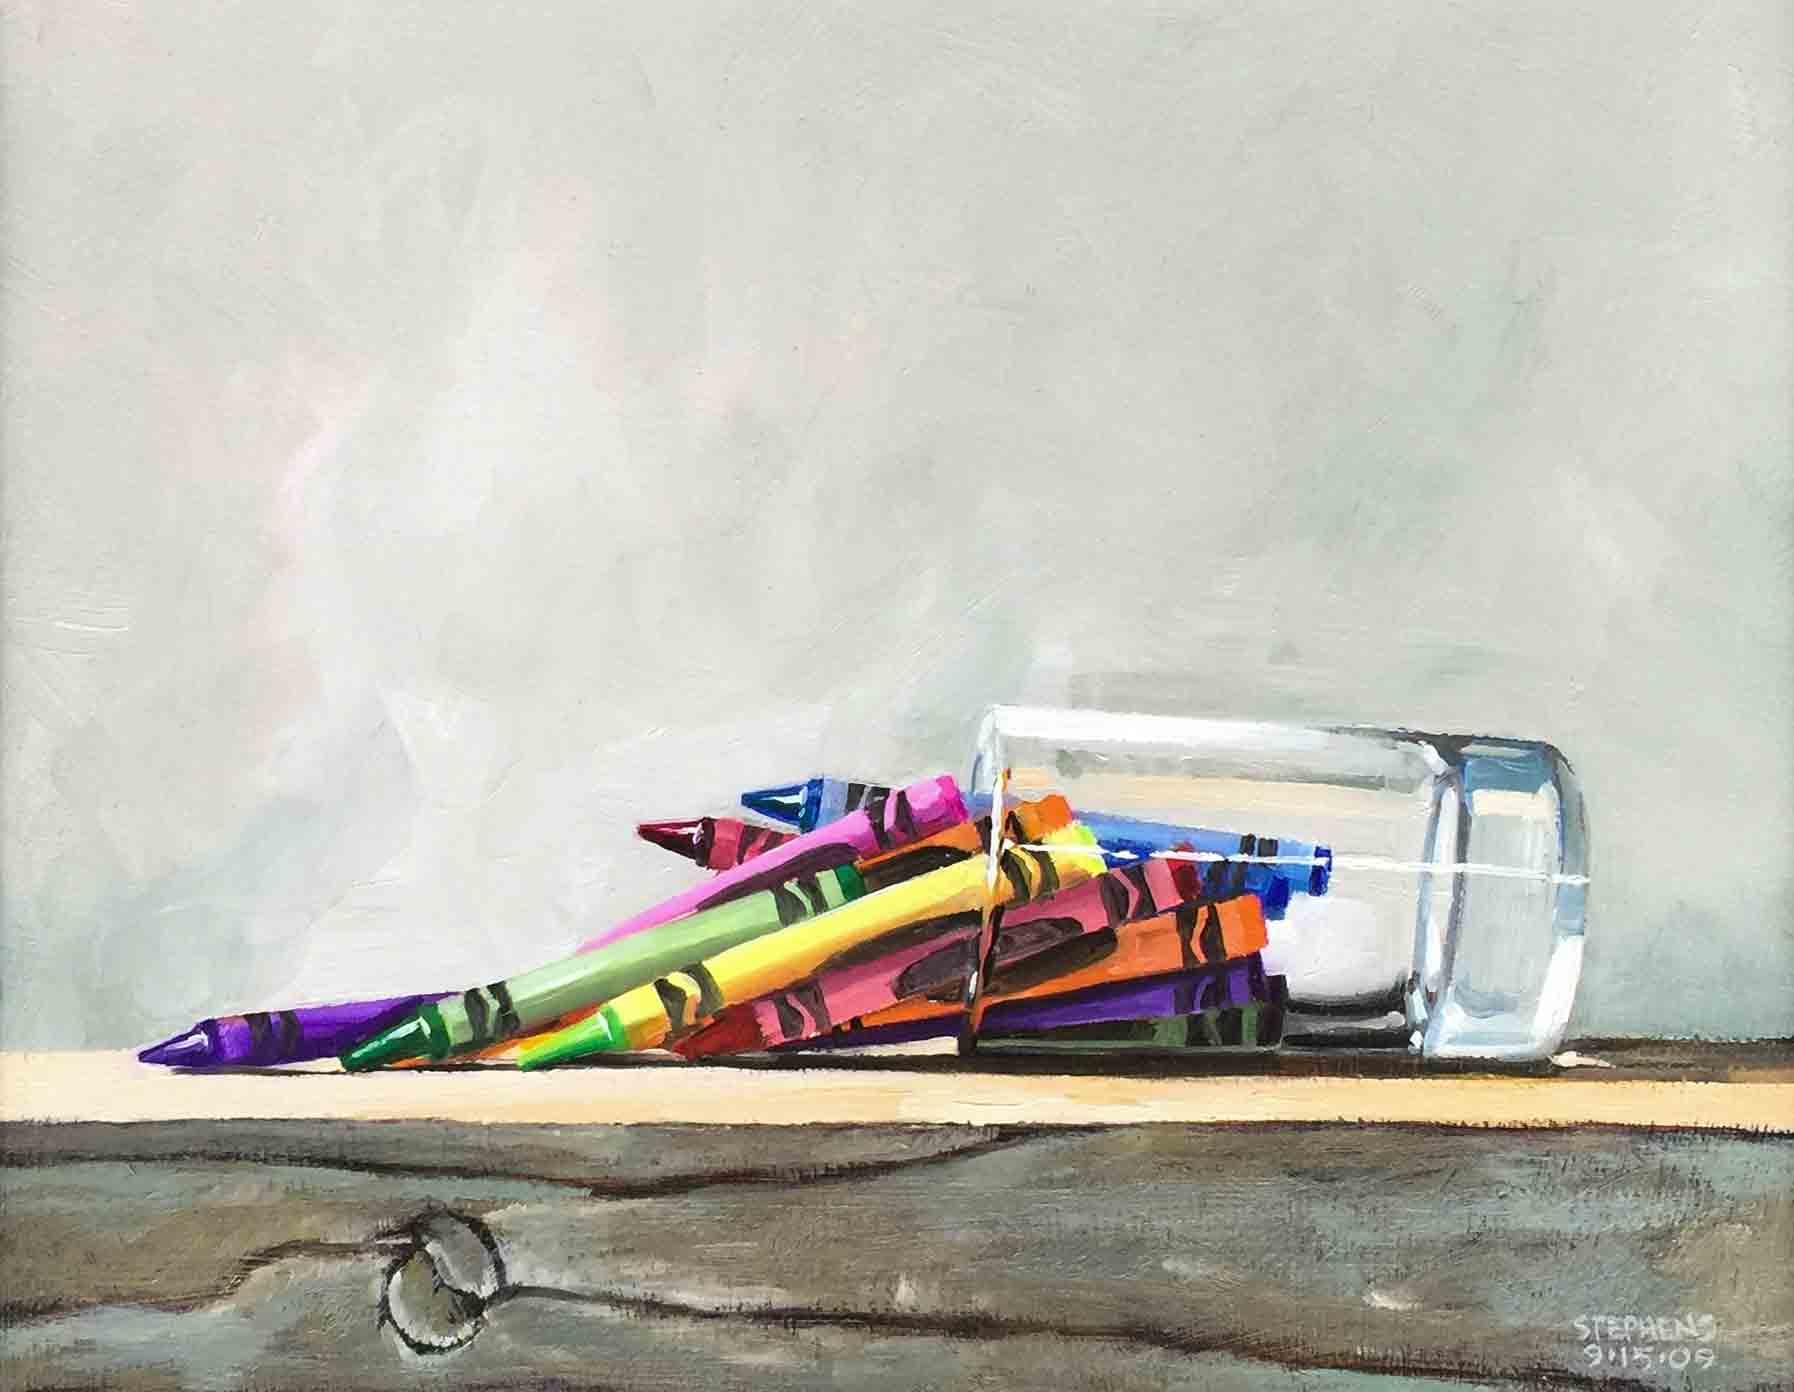 Craig Stephens, Spilled Crayons, 2009